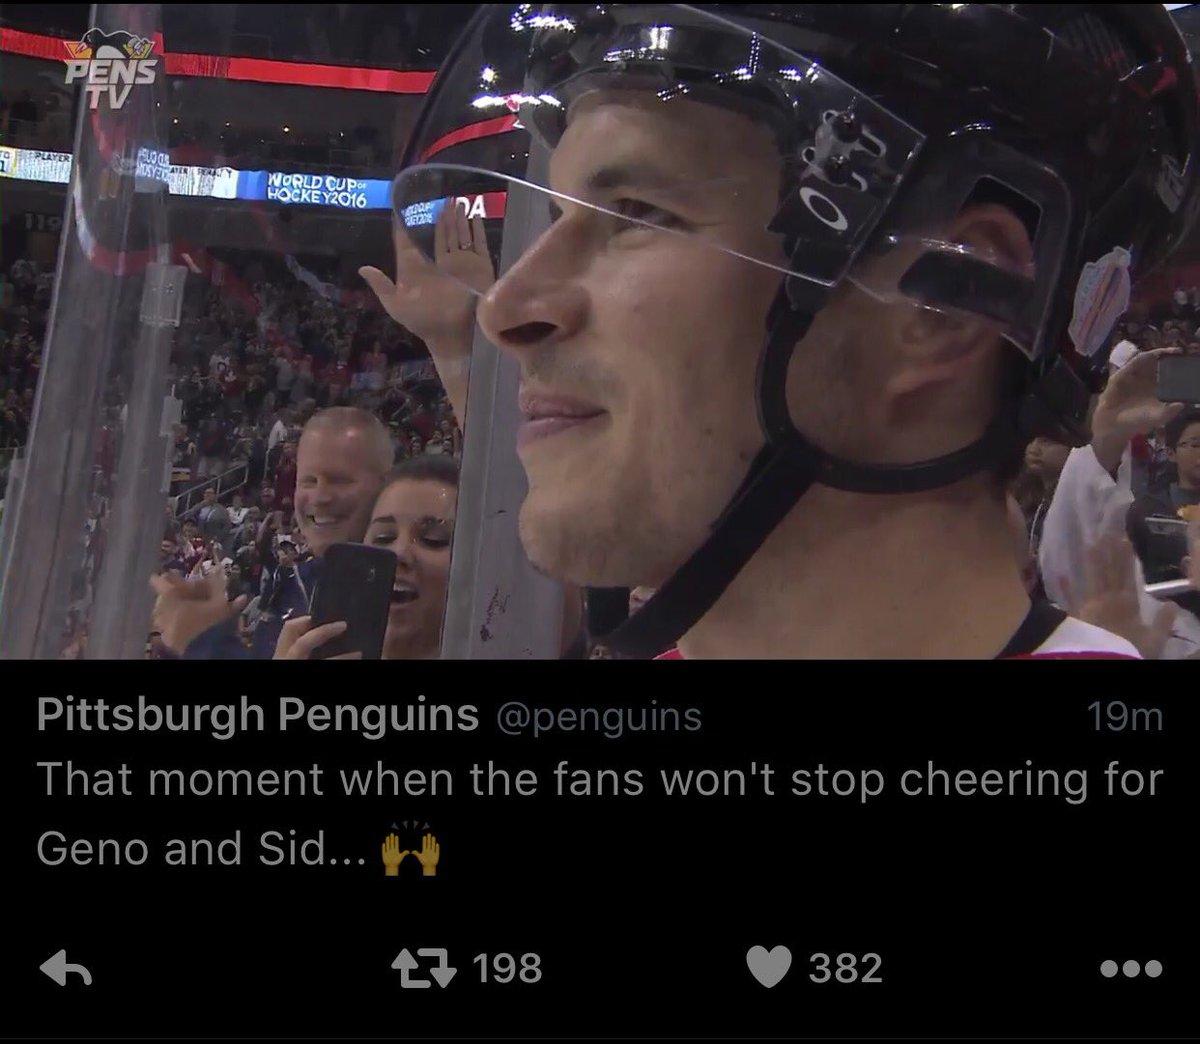 .@penguins Love this moment! Crosby loves Pittsburgh just as much as Pittsburgh loves Crosby. #WCH2016 #Pens https://t.co/PWg90C5kzp